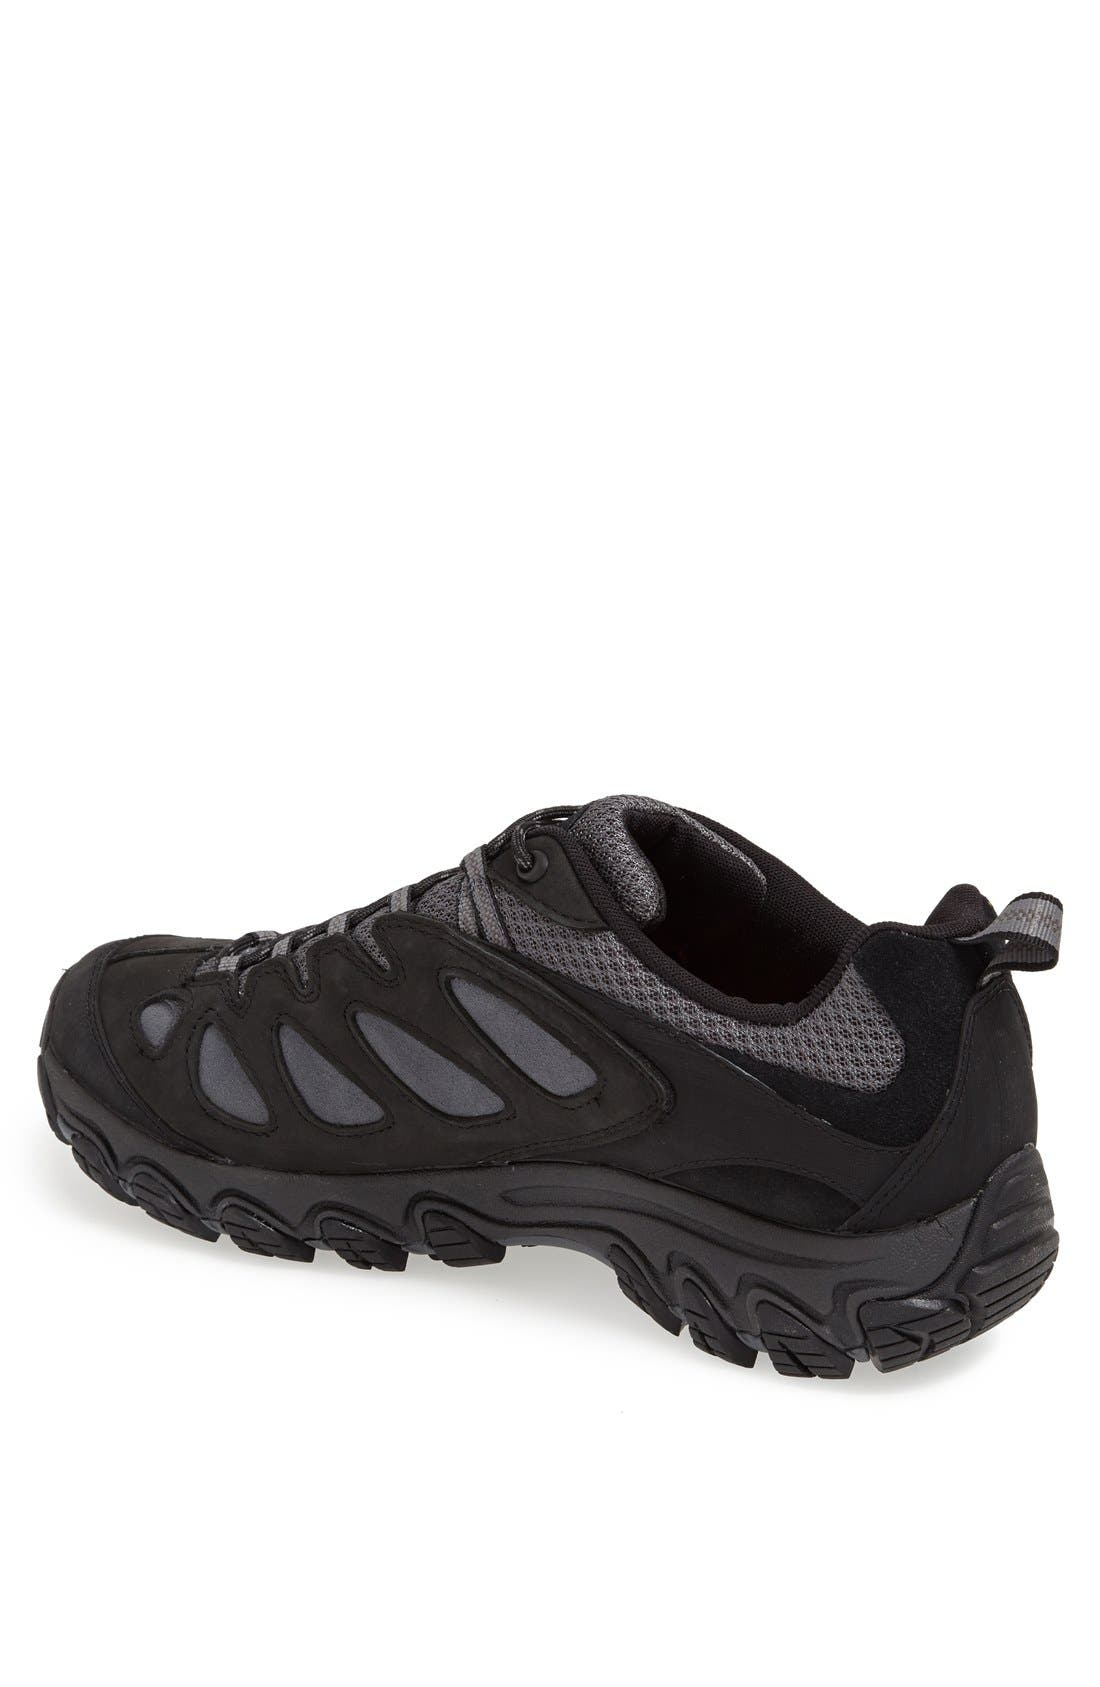 Alternate Image 2  - Merrell 'Pulsate' Hiking Shoe (Men)